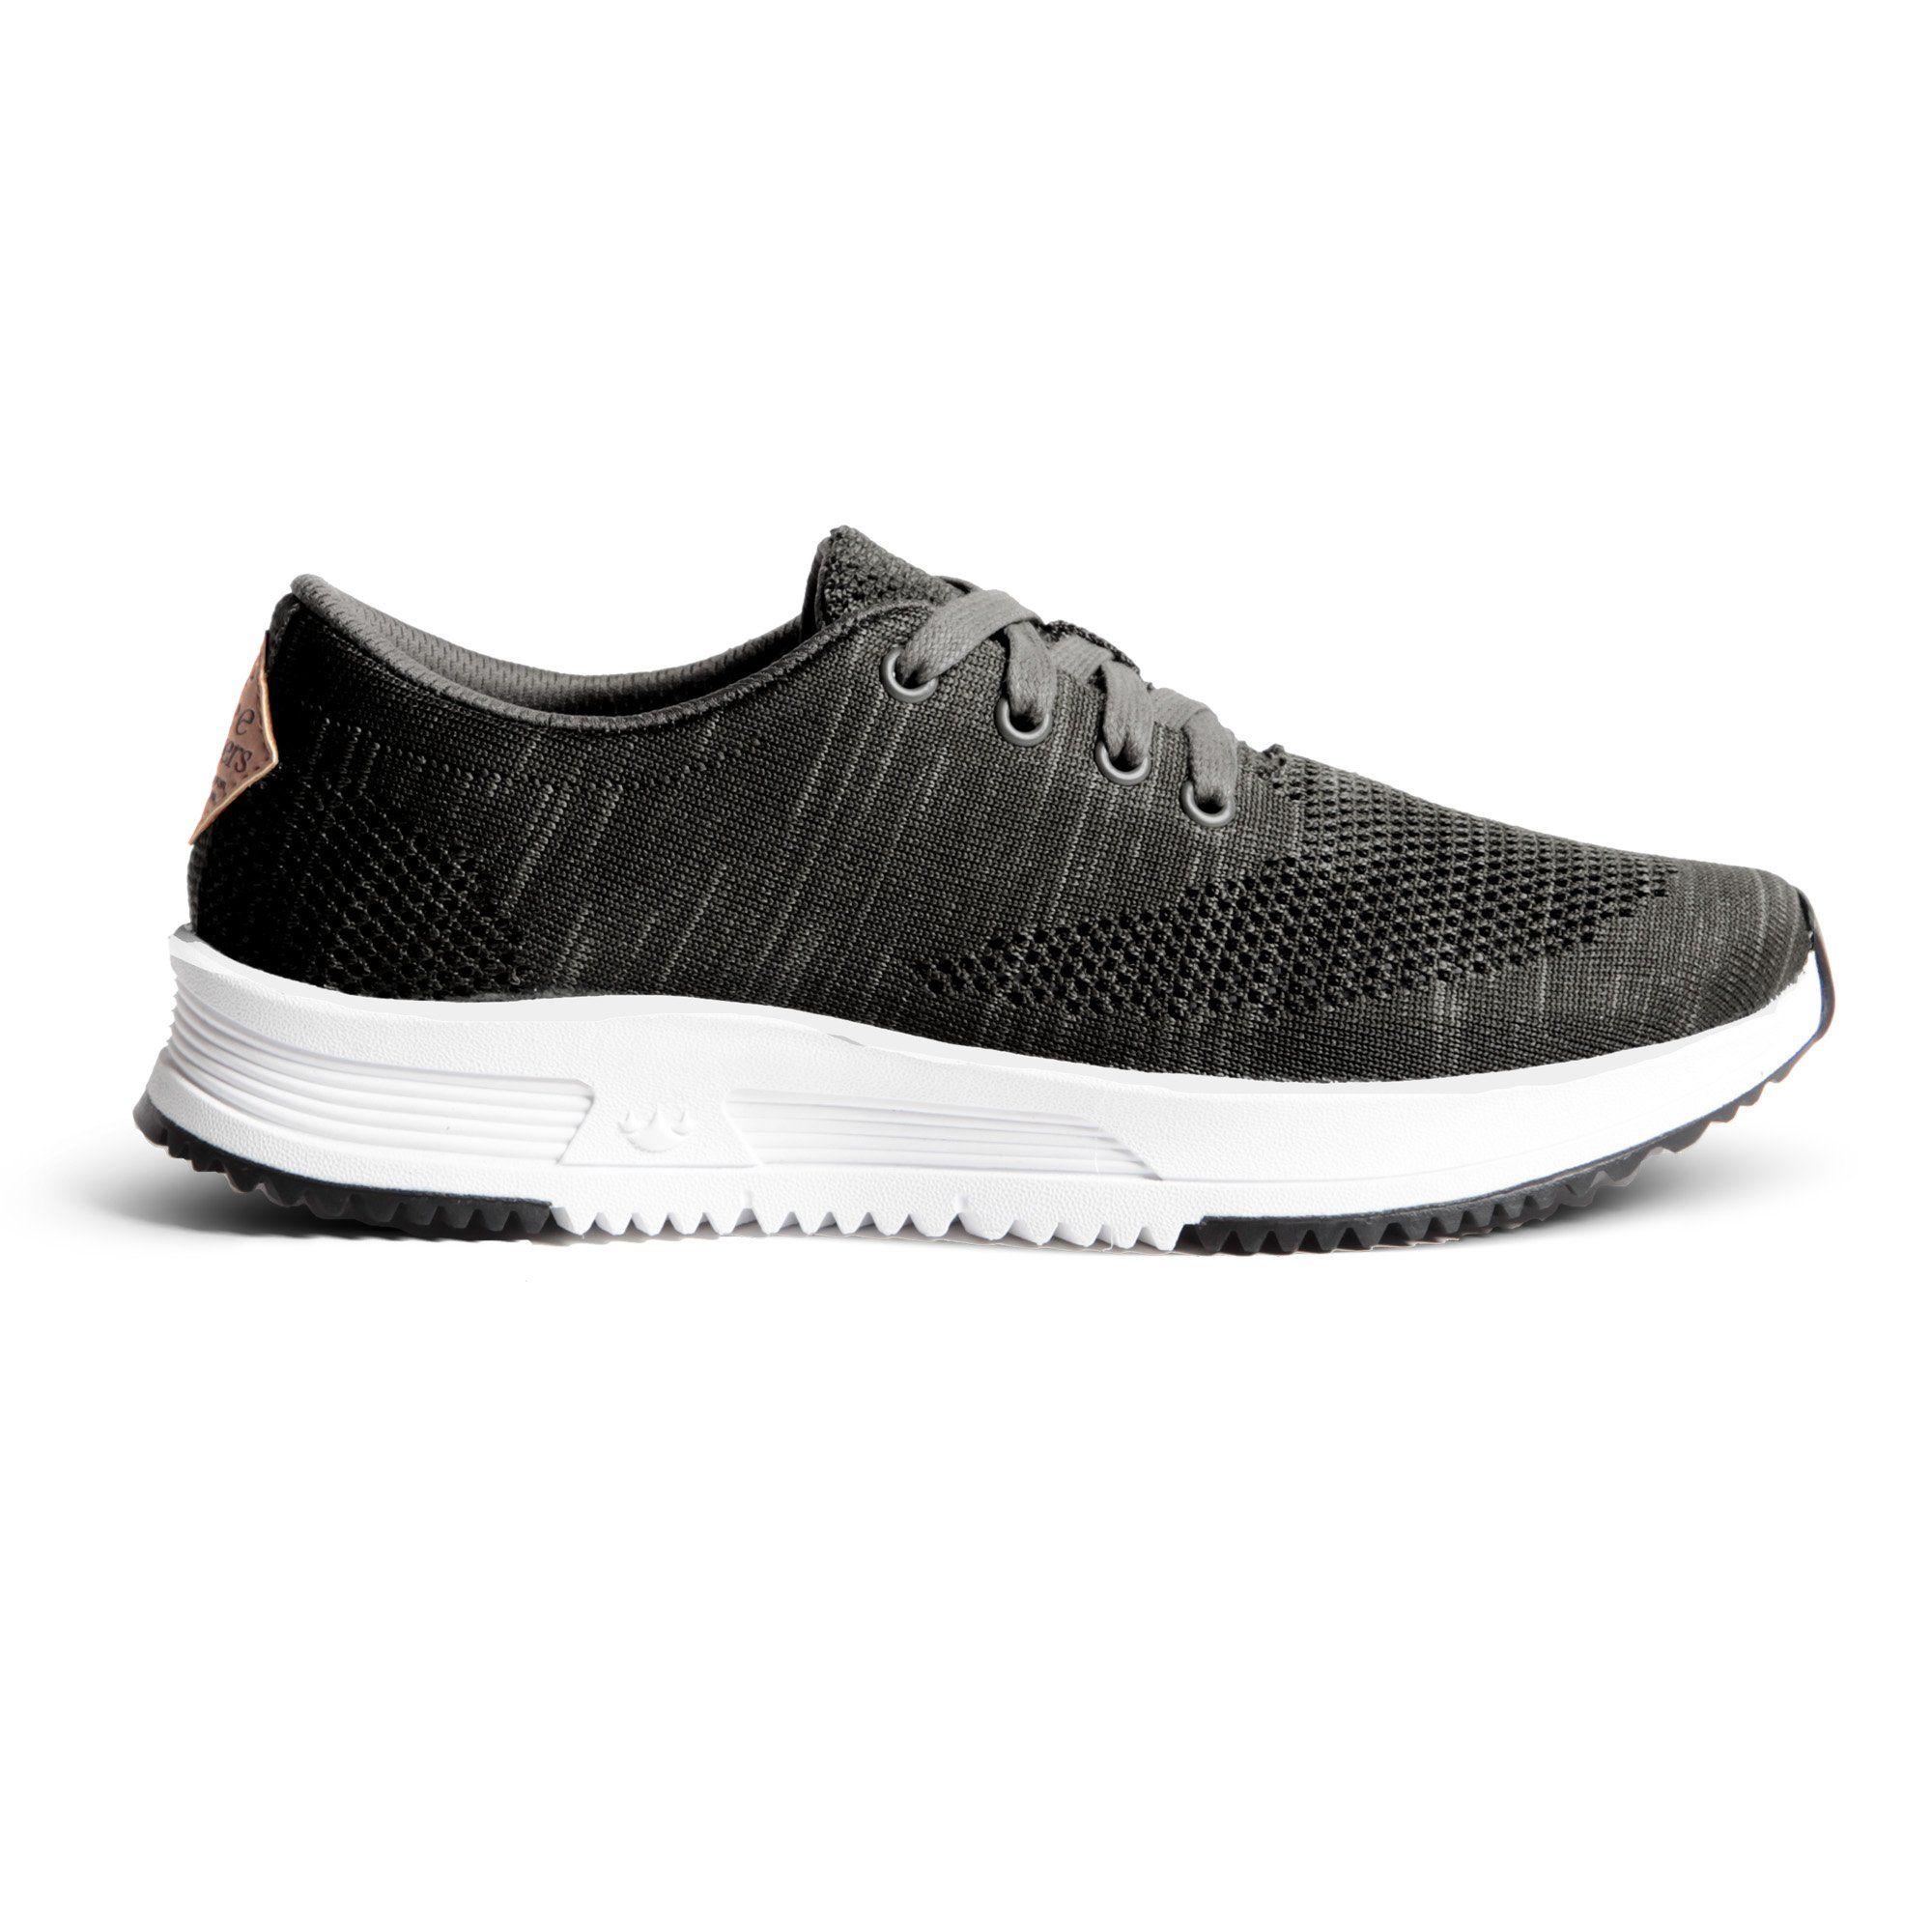 645b3c8c4 Sky Trainer Knit - Black Grey – Freewaters